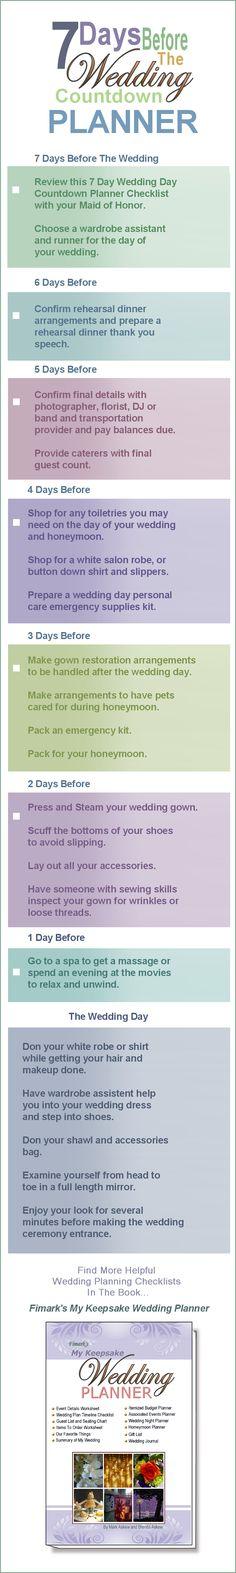 7 Day Wedding Countdown Checklist.